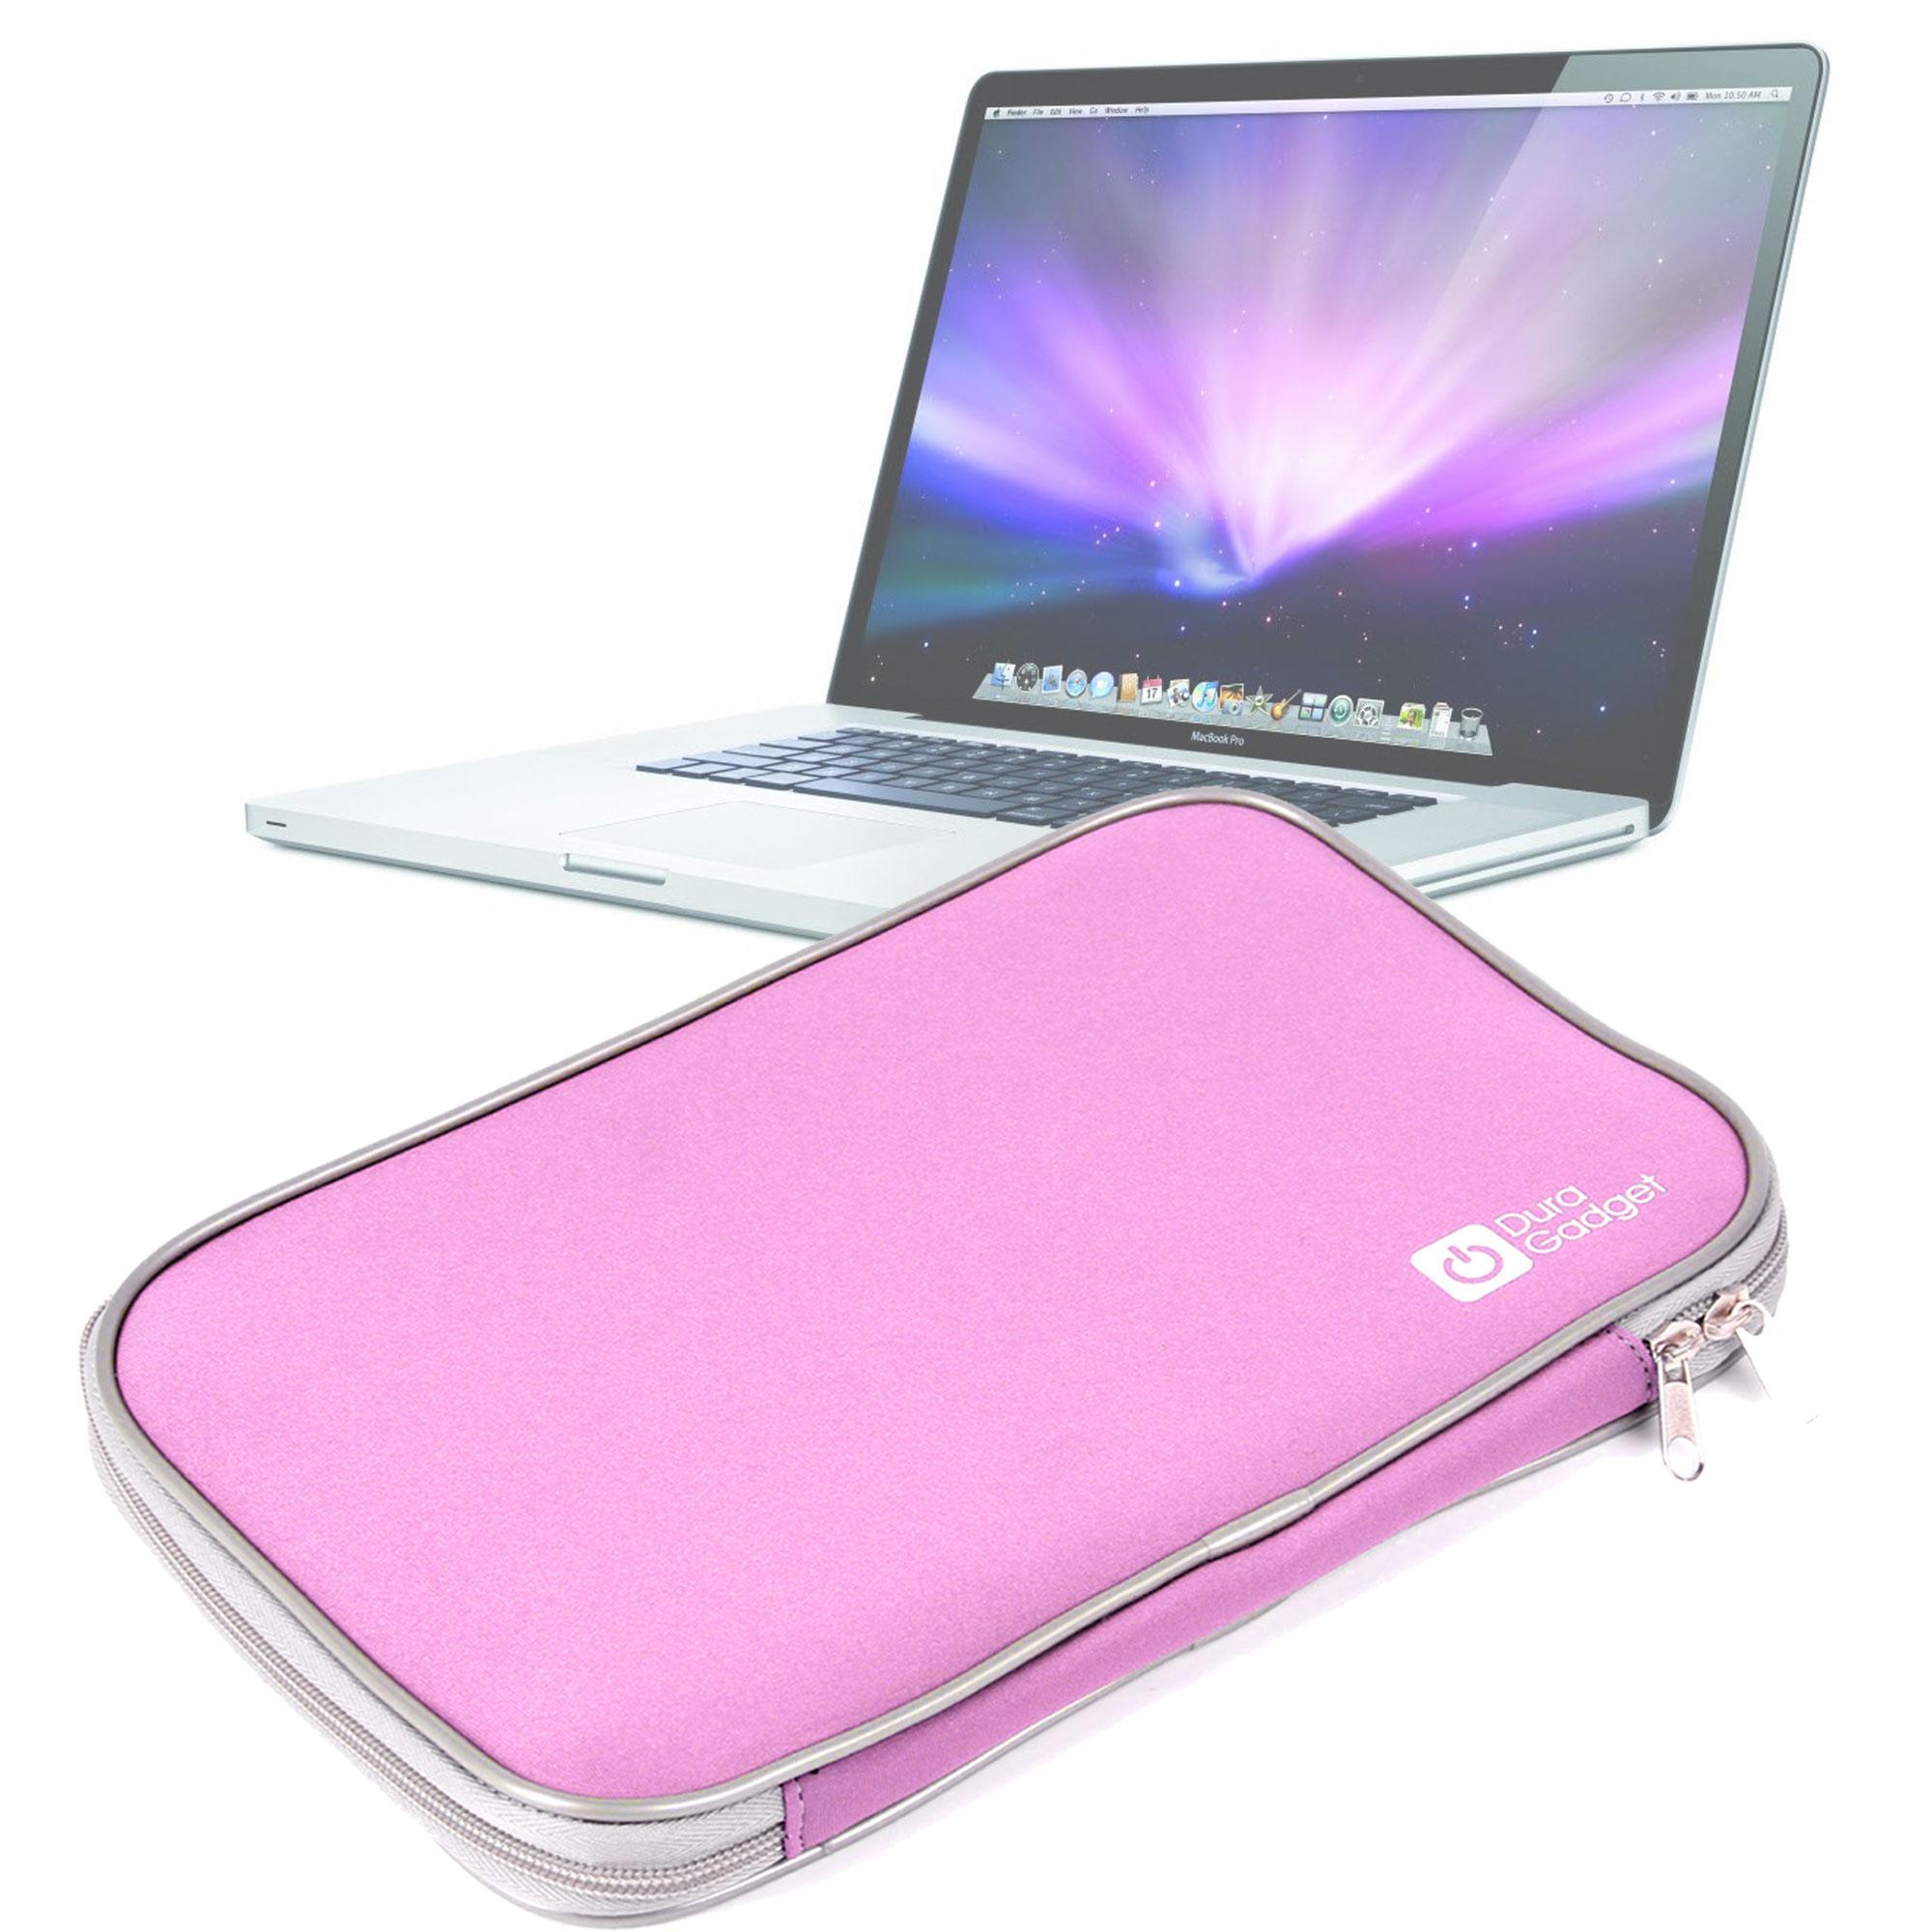 Waterproof Pink laptop Case For Apple 17-inch MacBook Pro ...